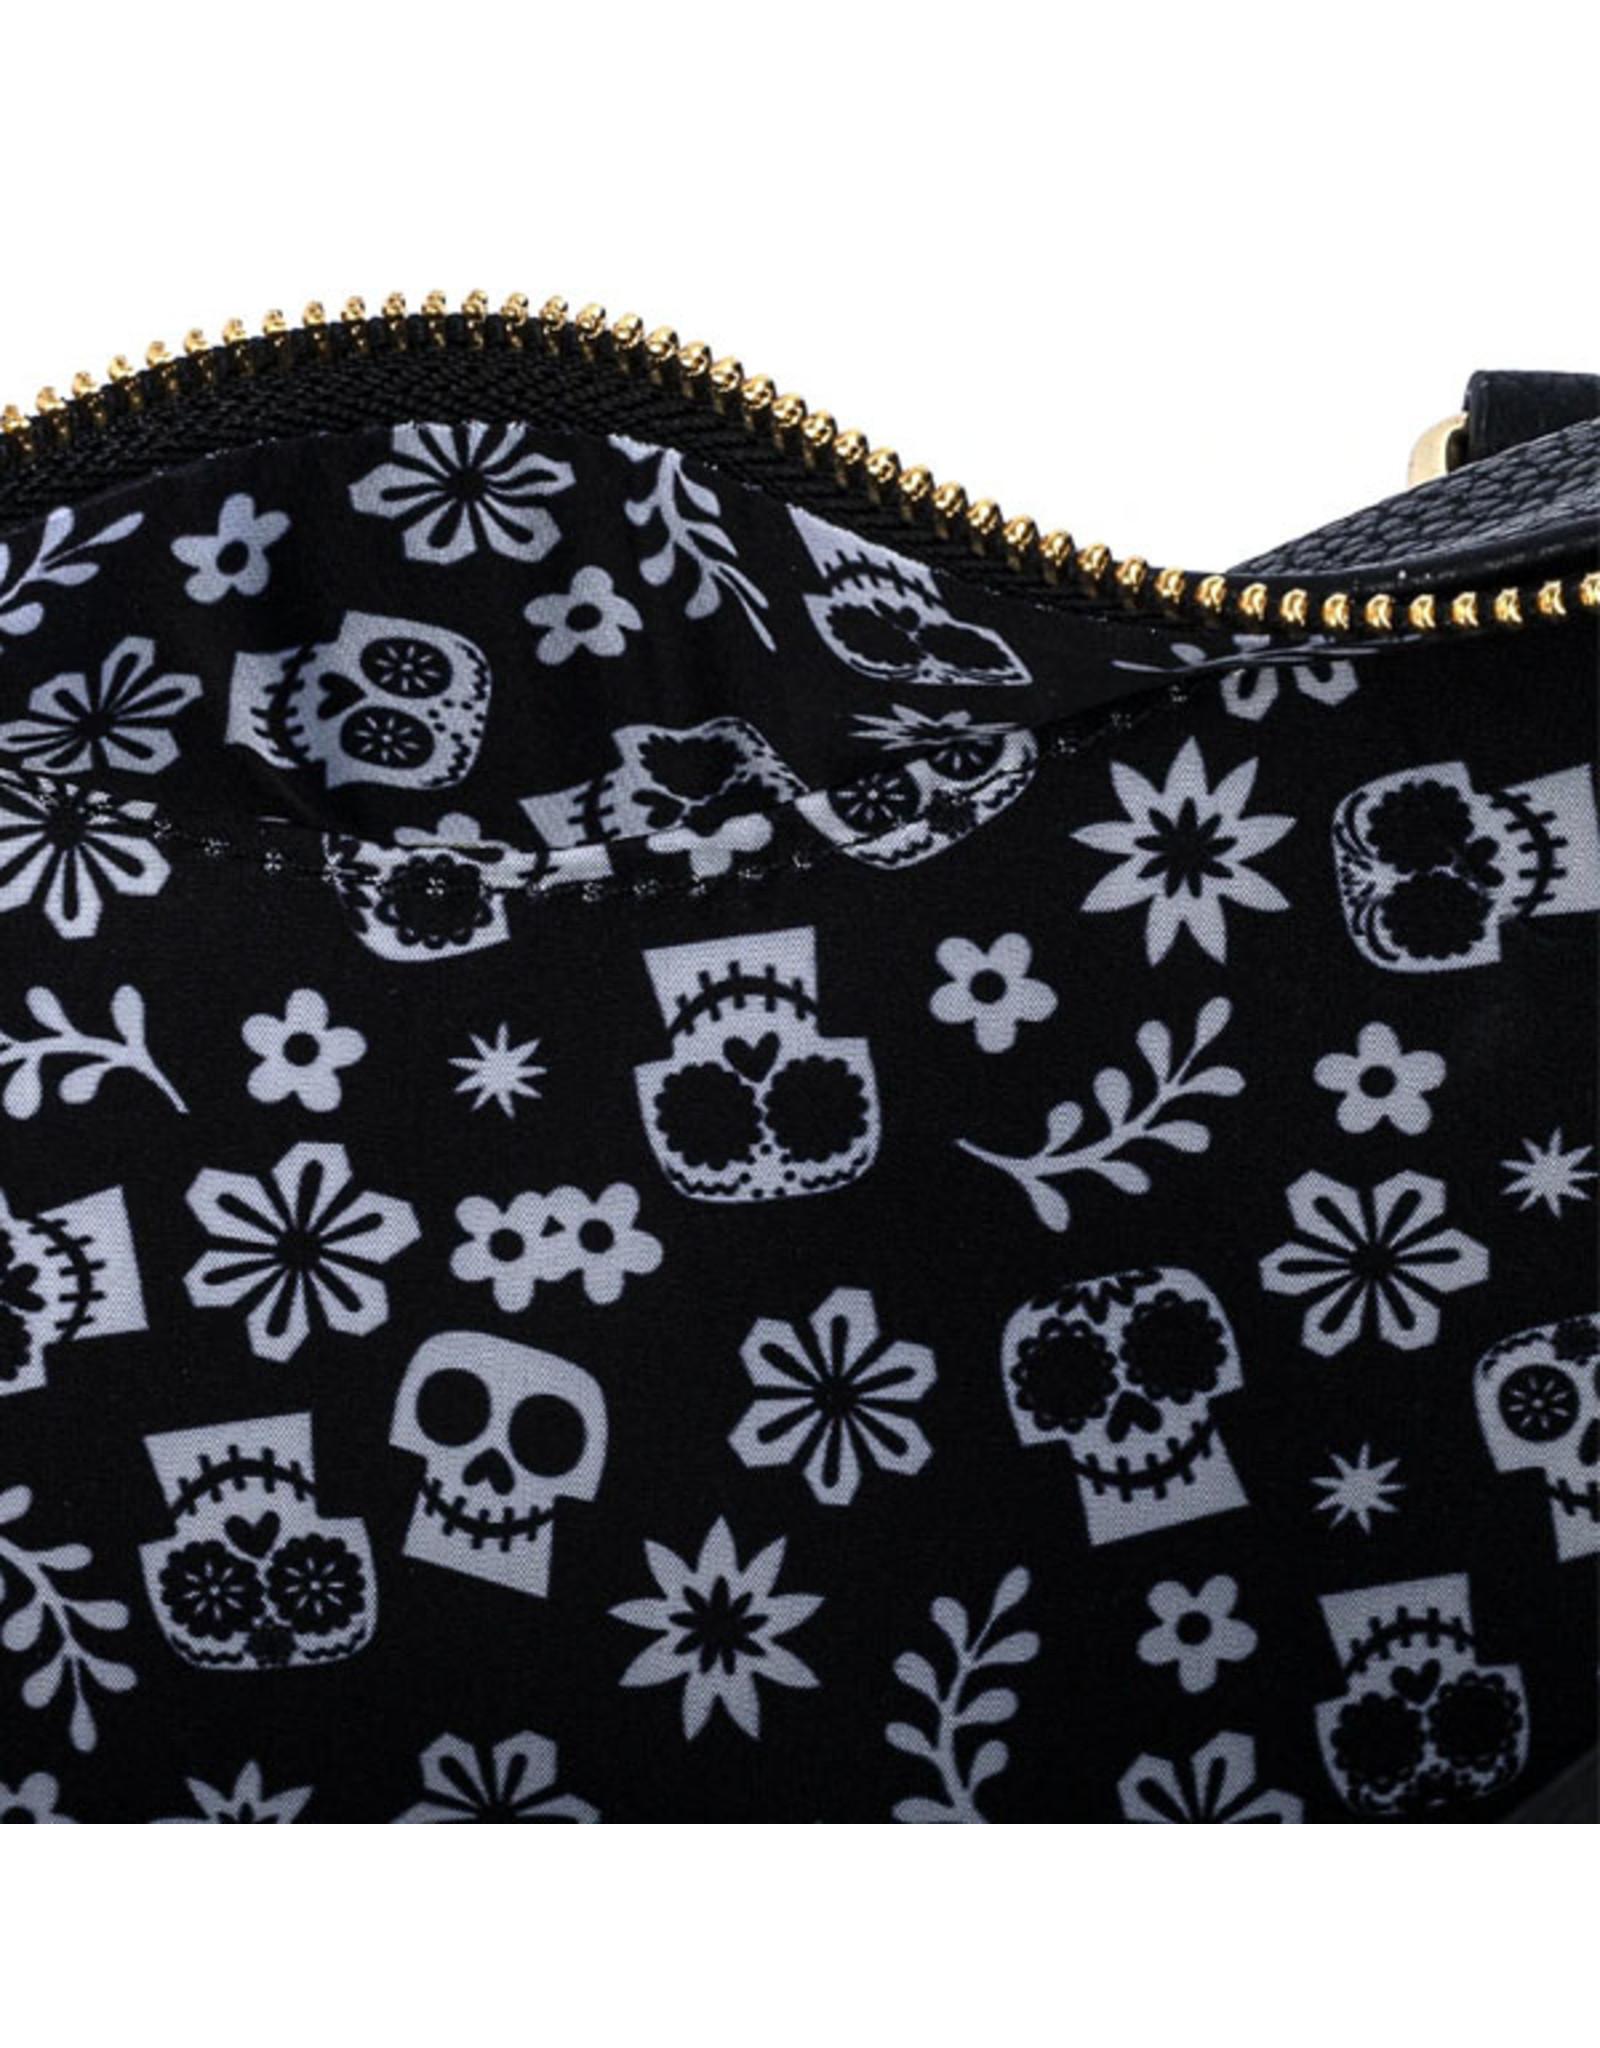 Loungefly COCO Cross Body Bag - Guitar Case